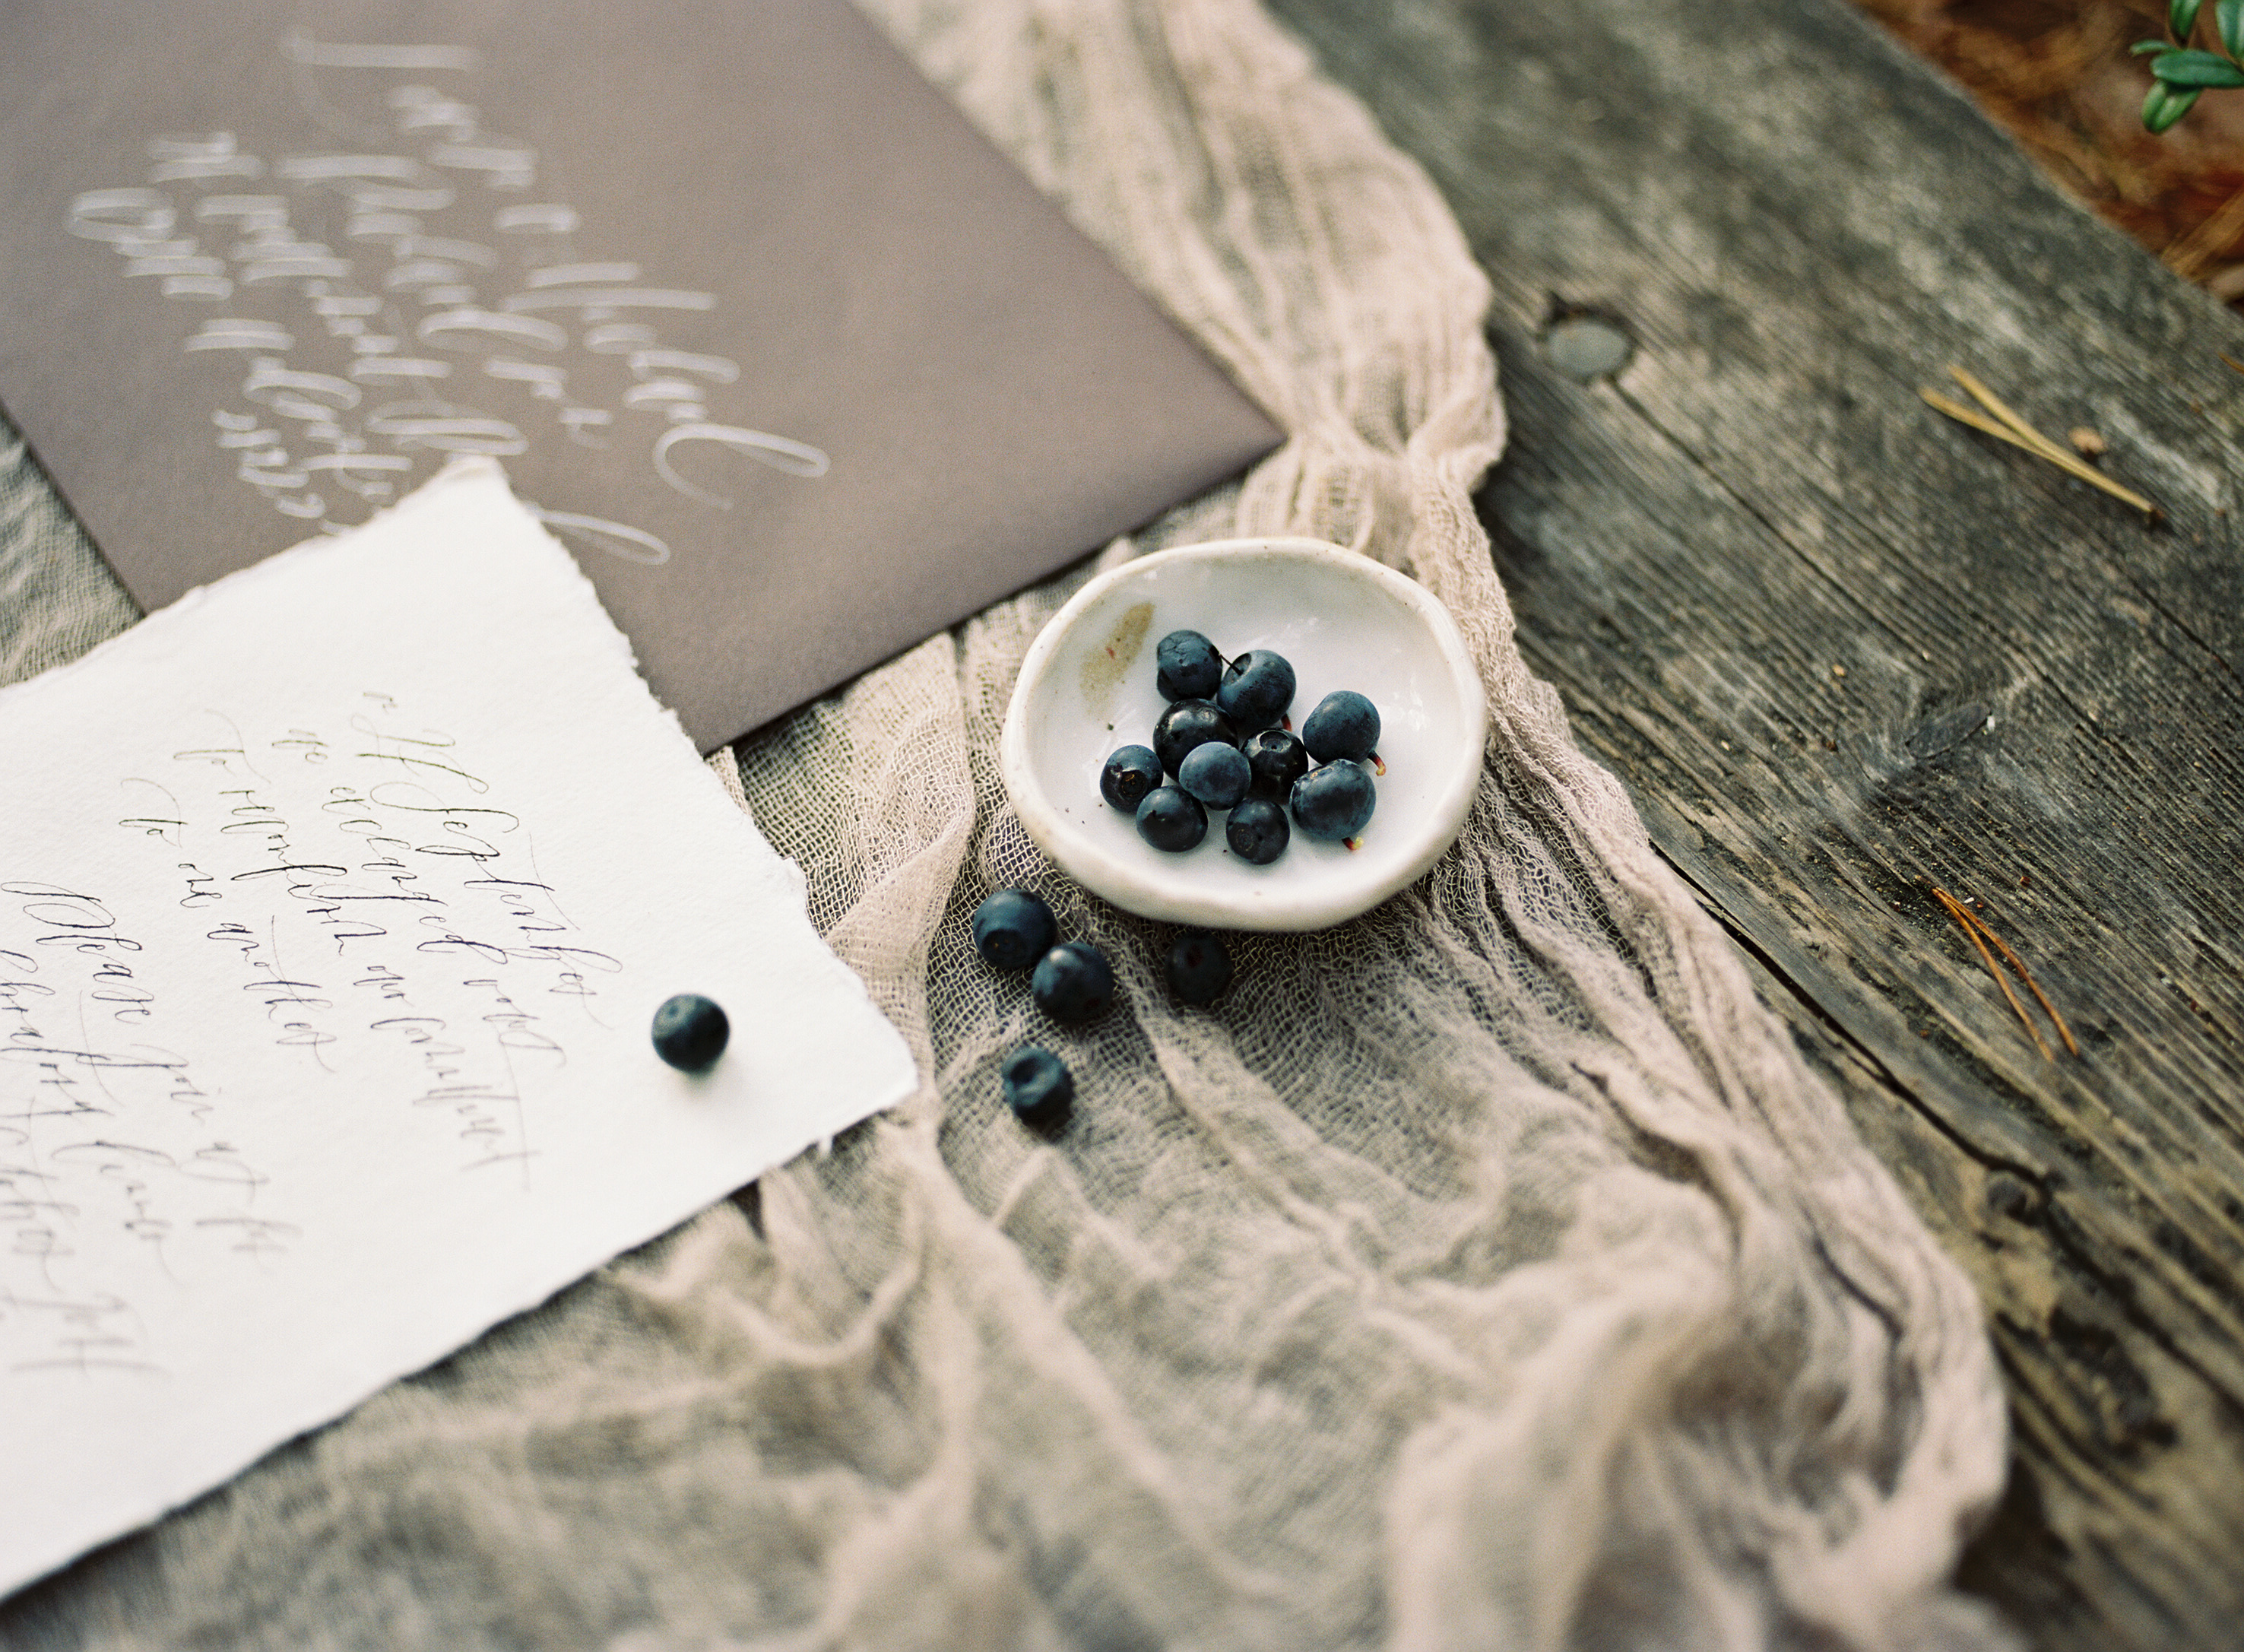 Organic autumn wedding planning